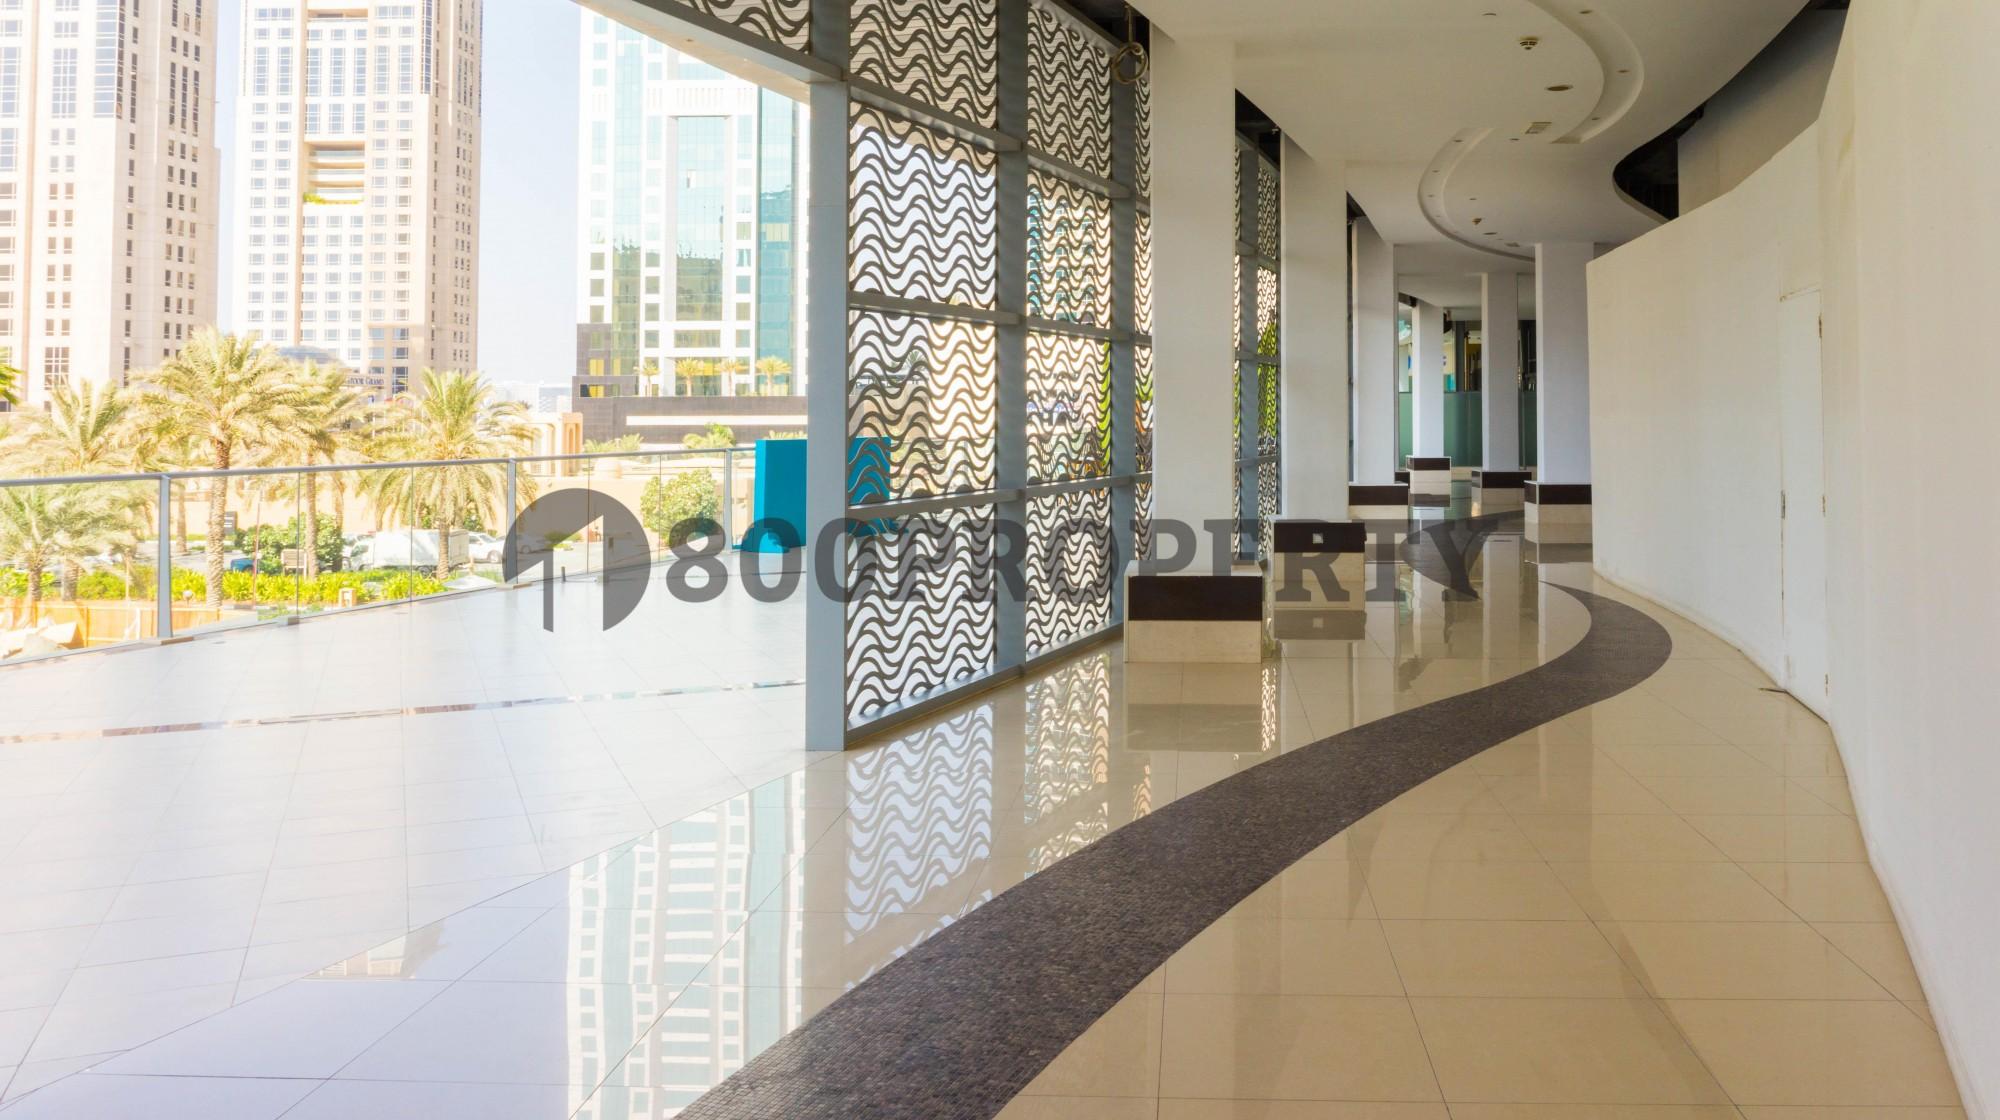 Retail space For Rent In Prestigious Marina